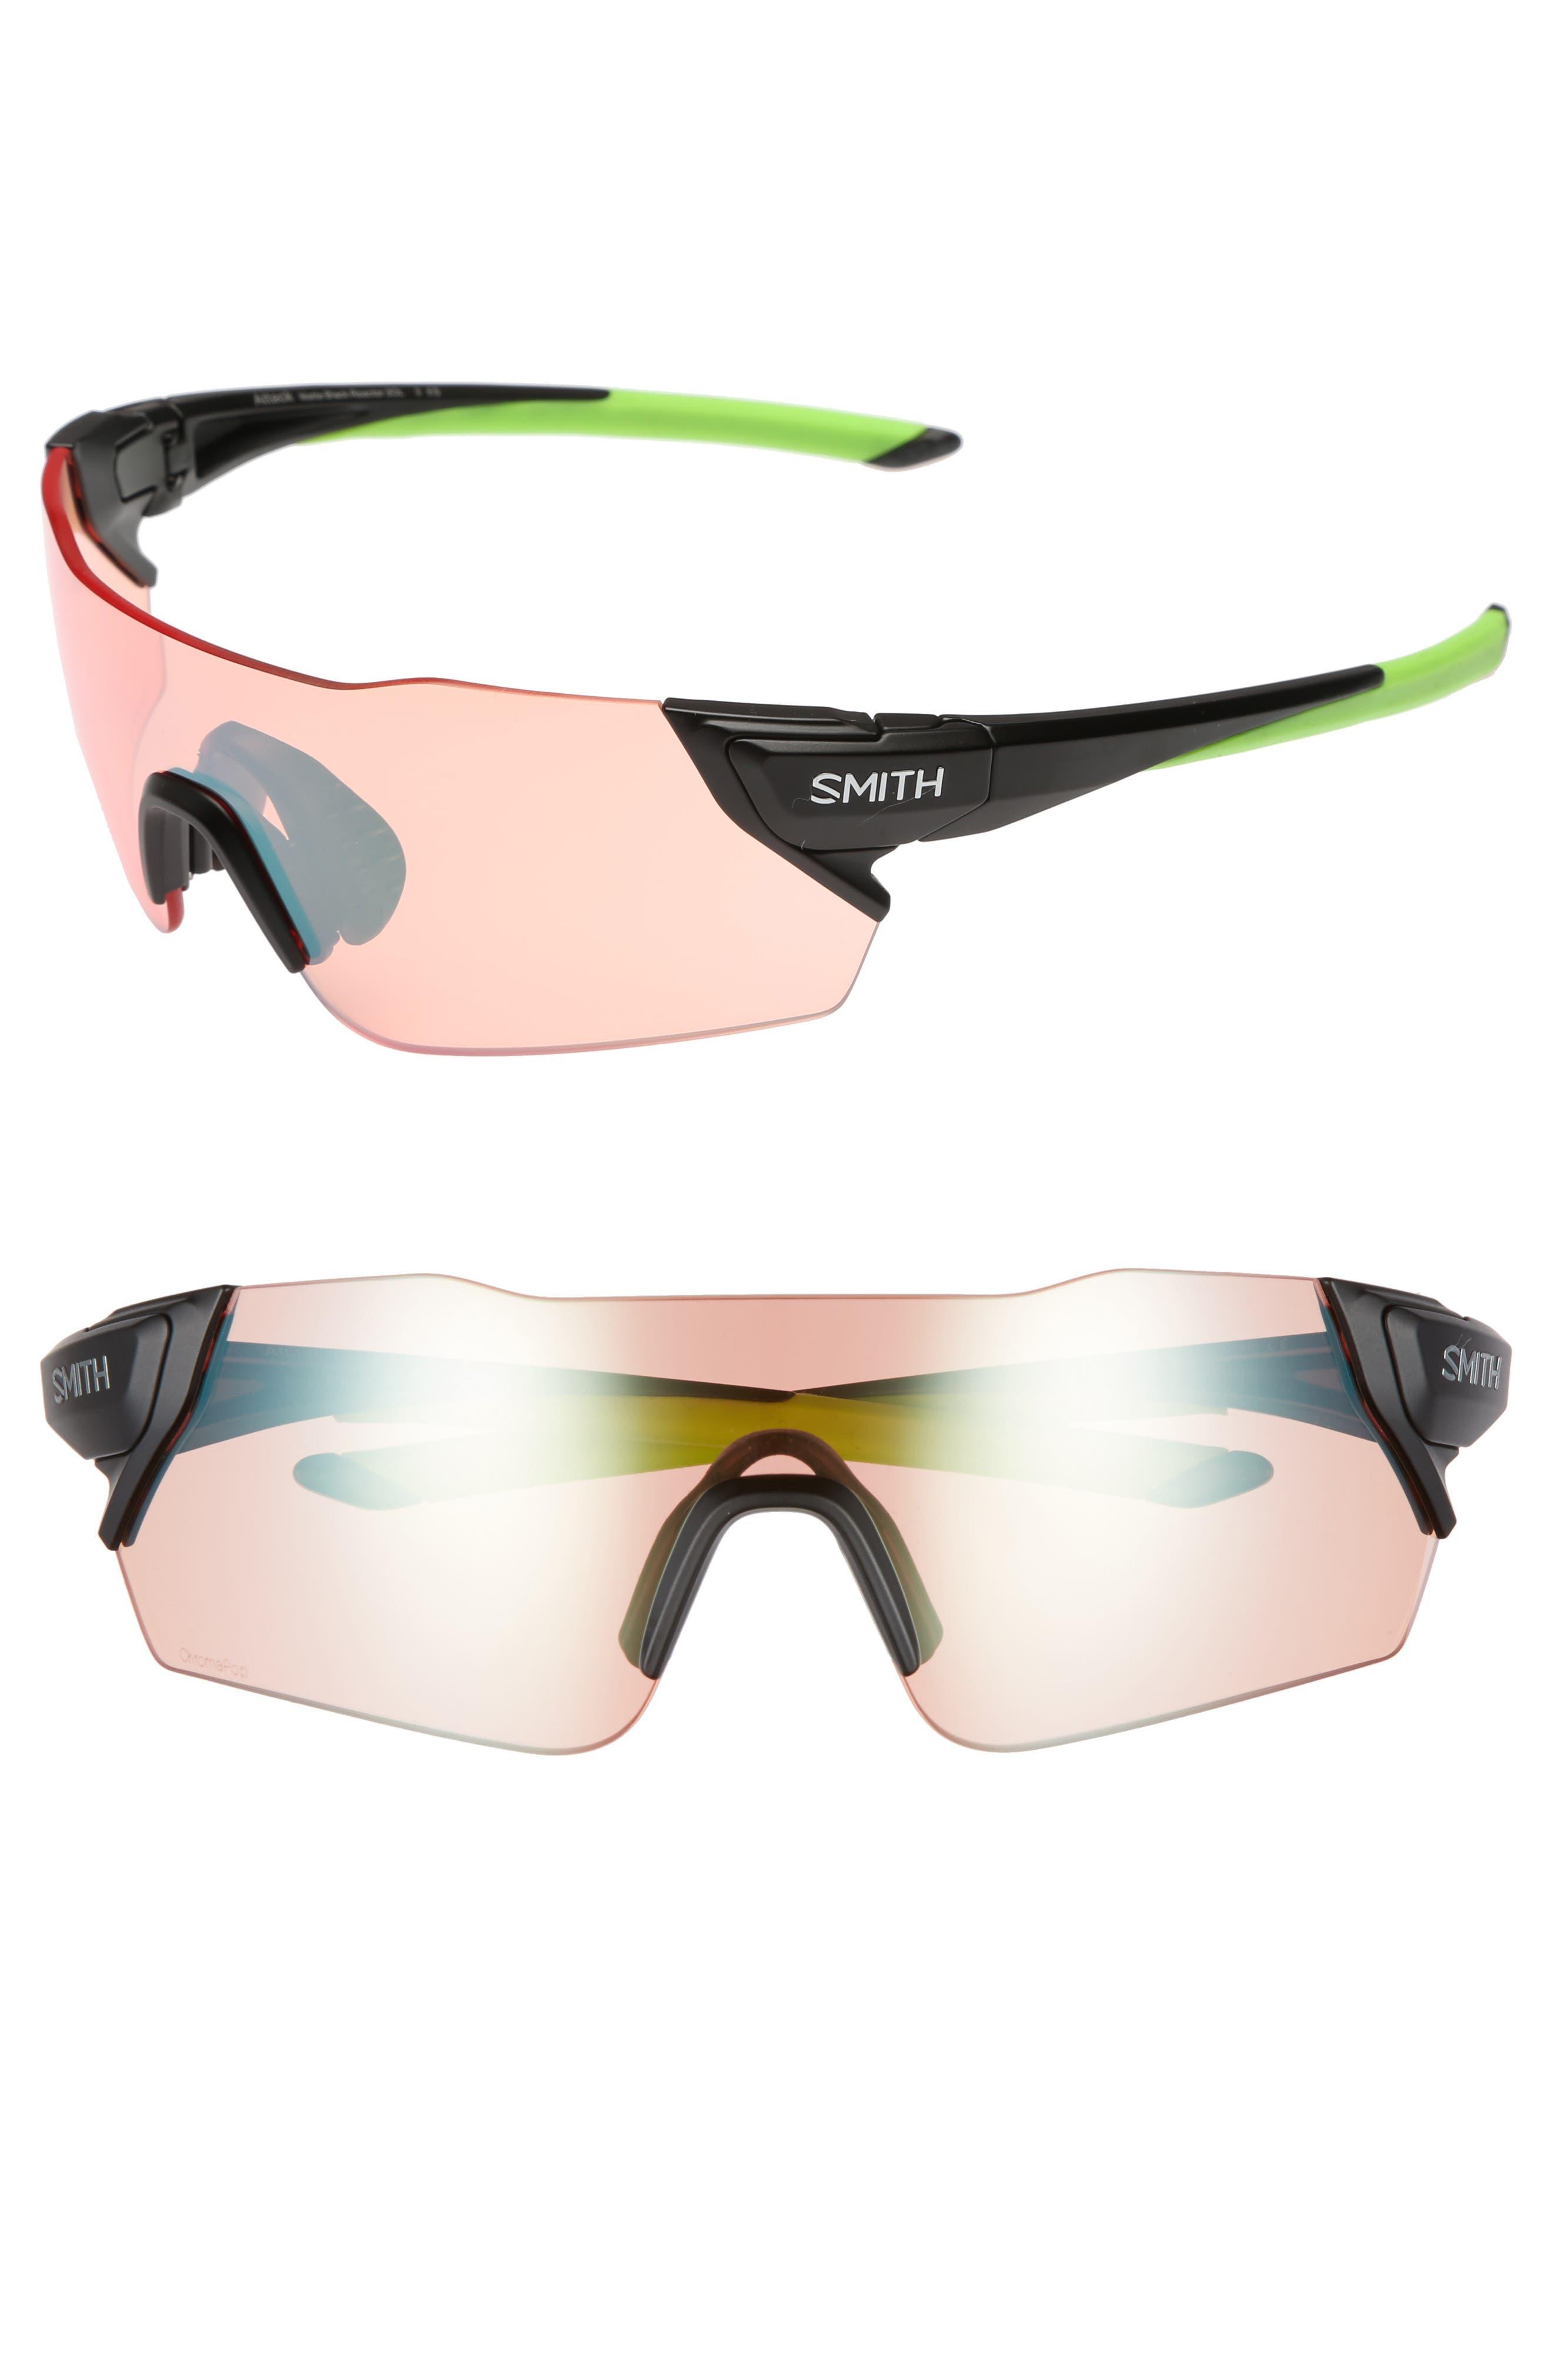 Attack 125mm ChromaPop<sup>™</sup> Polarized Shield Sunglasses,                         Main,                         color, Matte Black Reactor/ Green